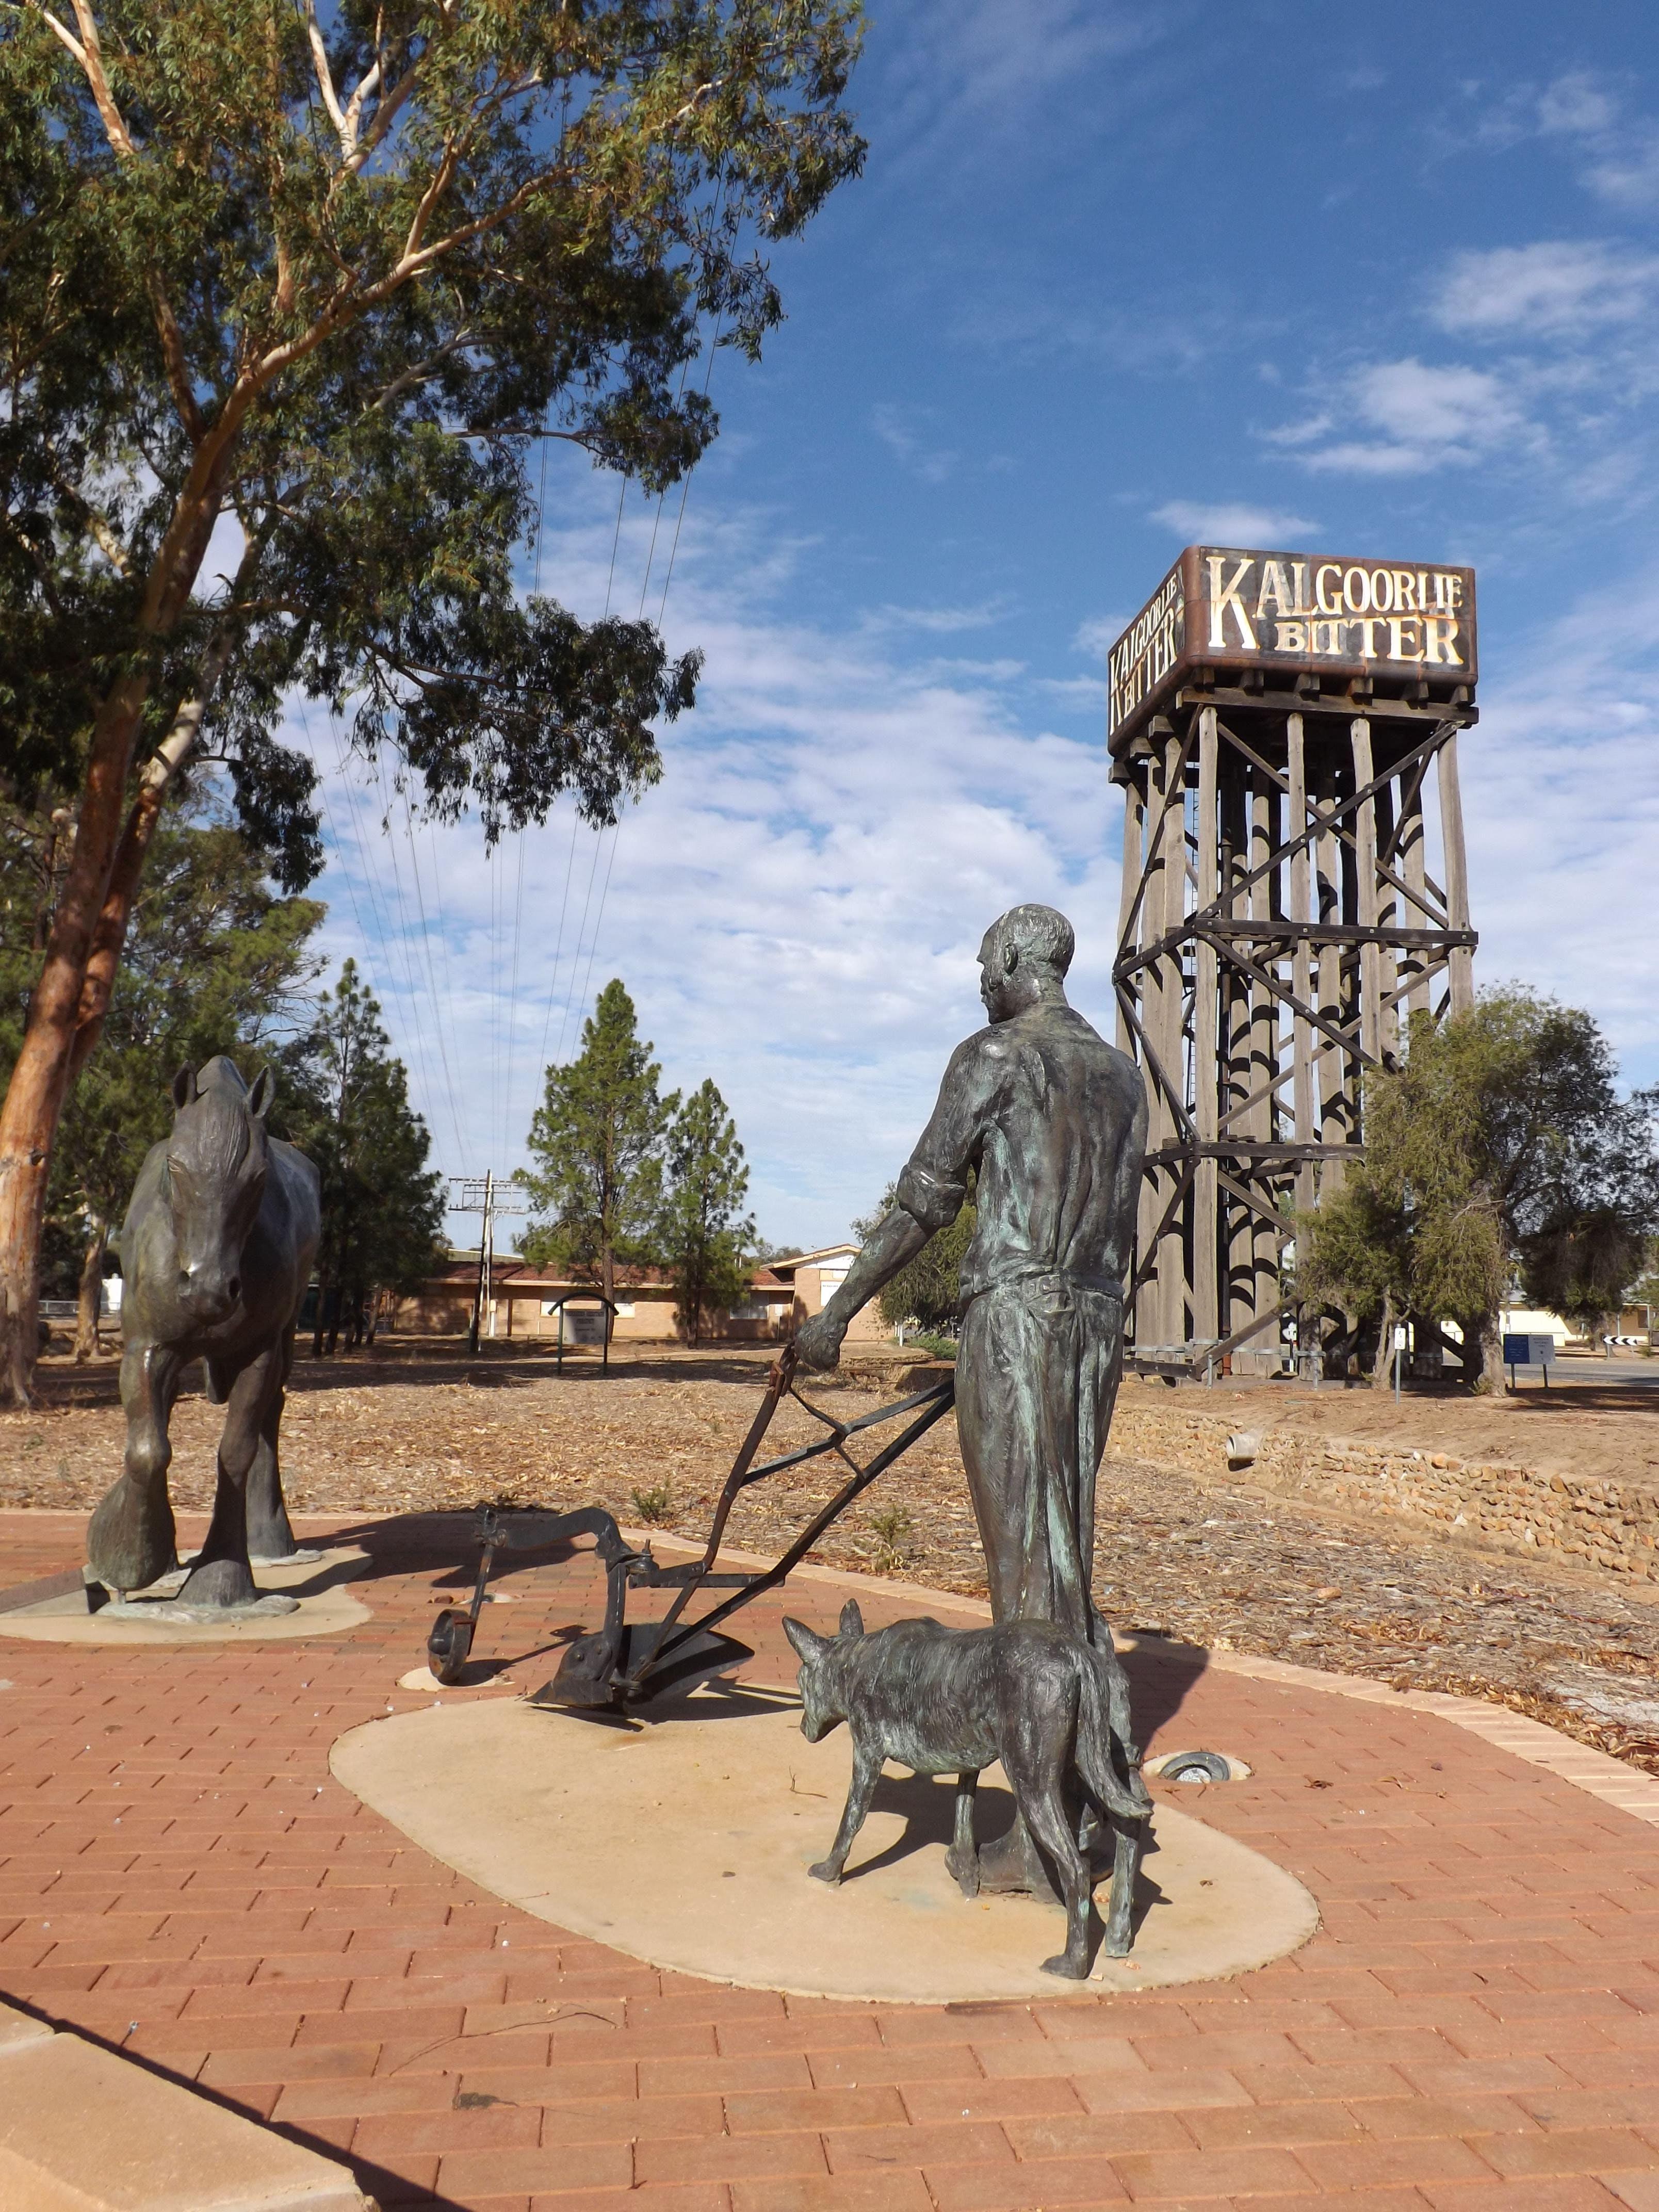 Merredin Railway Water Tower, Merredin, Western Australia